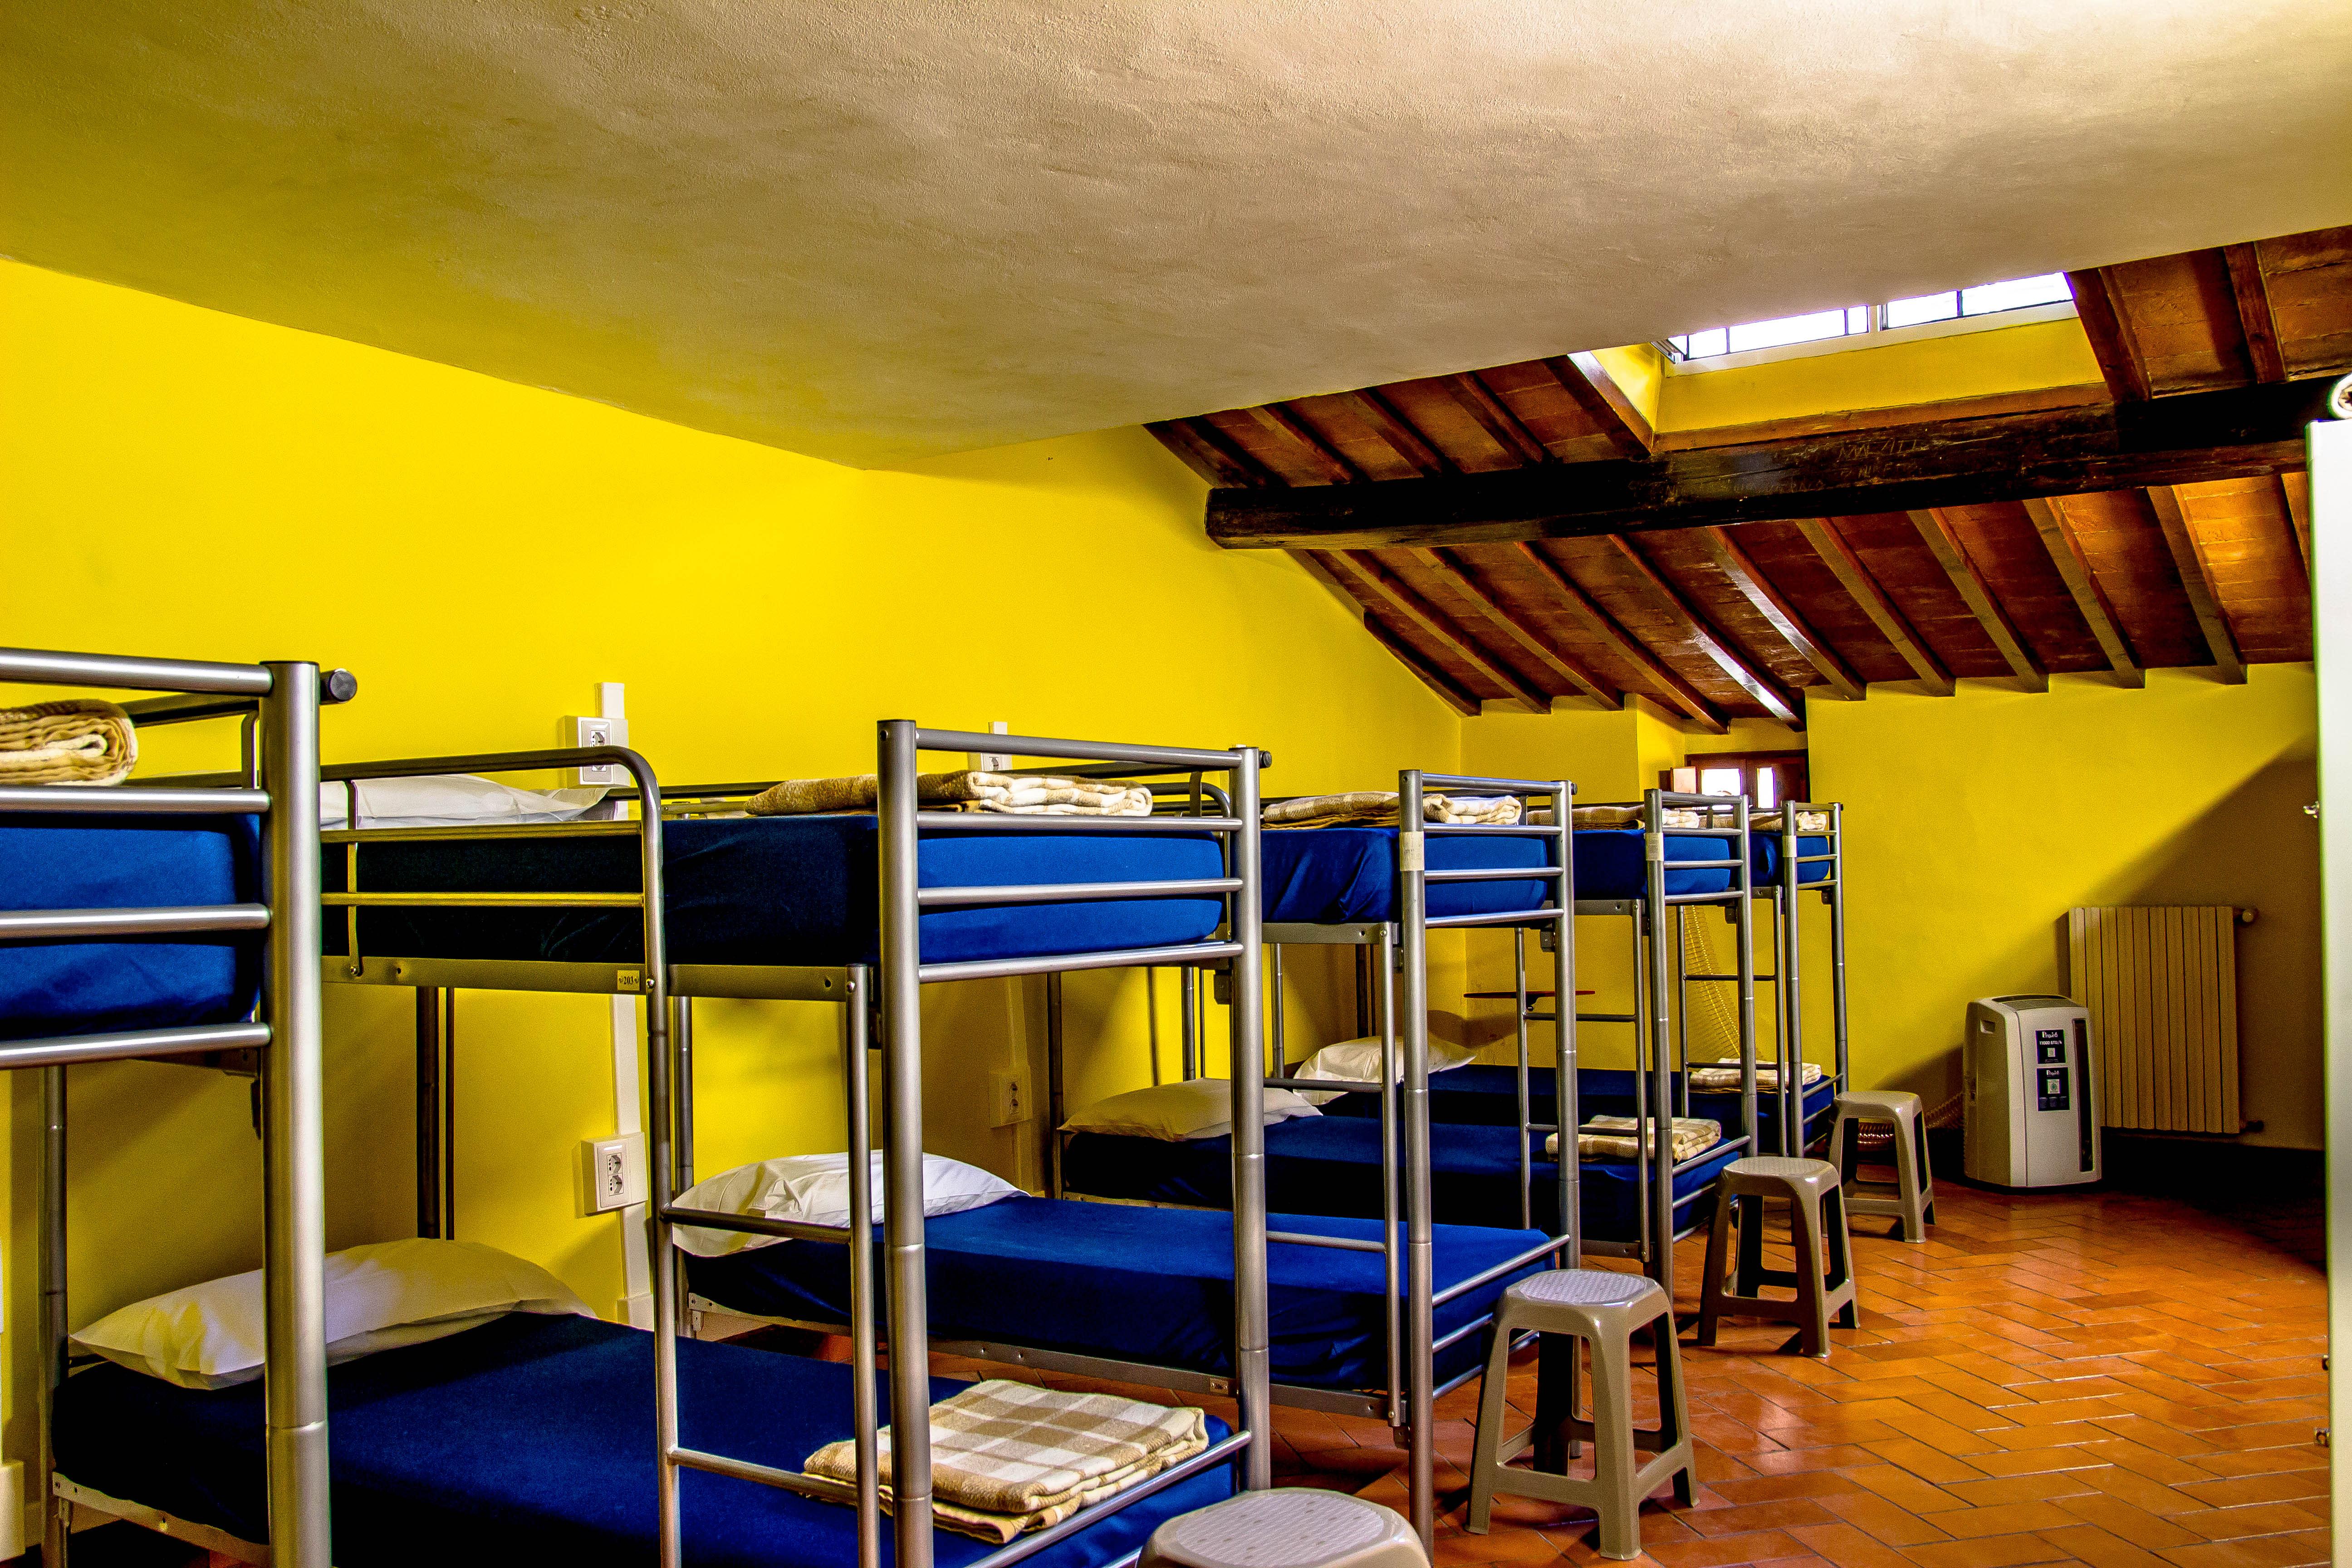 Hostel Santa Monaca